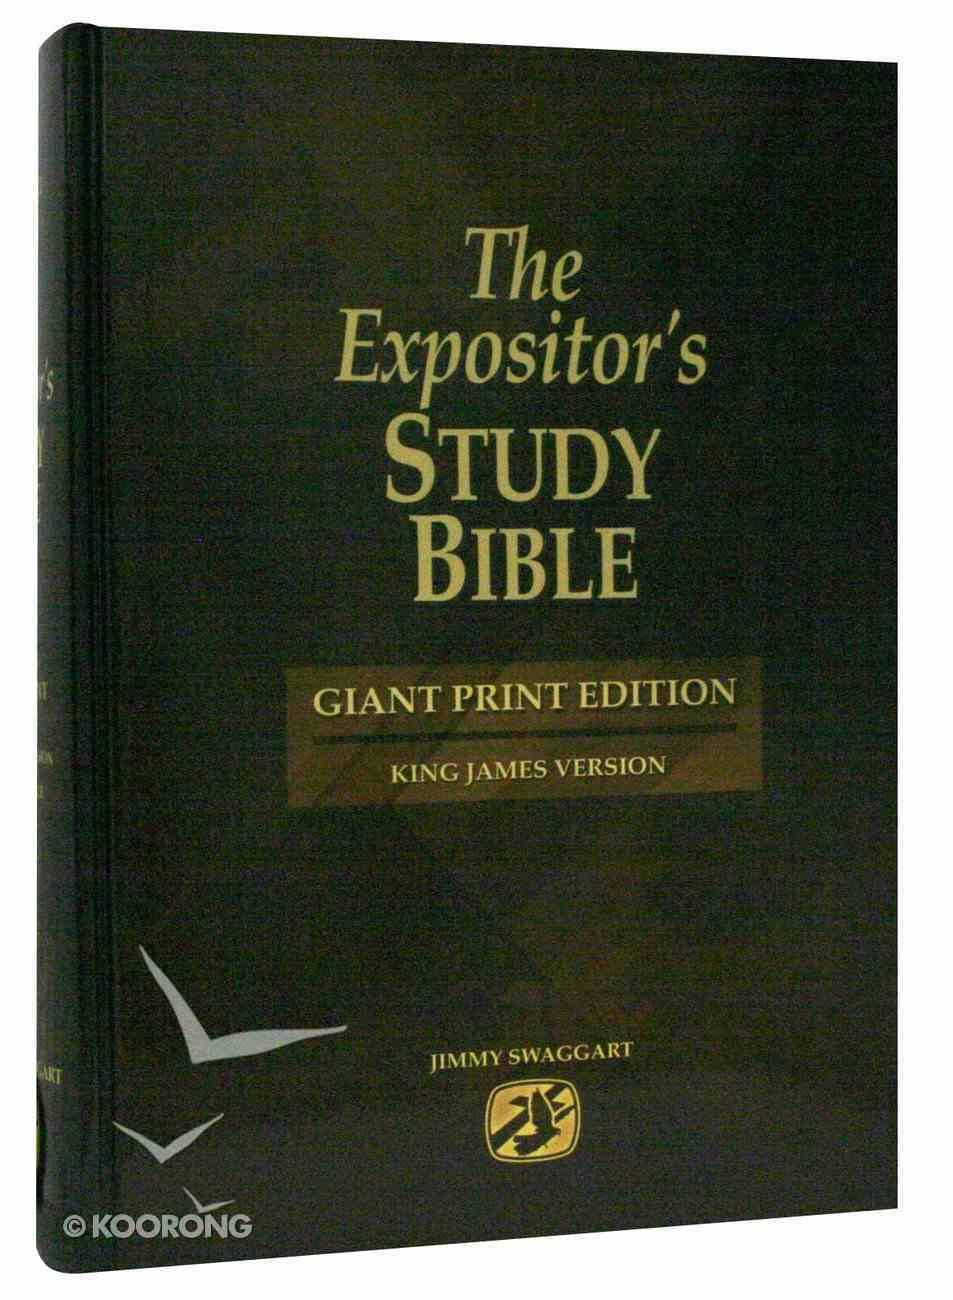 KJV Expositor's Study Bible Giant Print Hardback